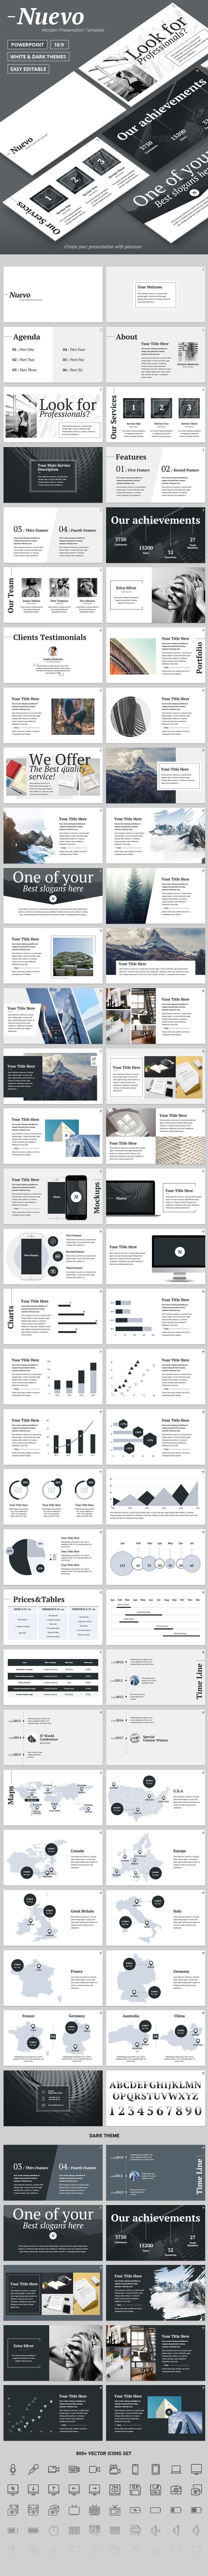 Nuevo - Modern & Clean PowerPoint Template